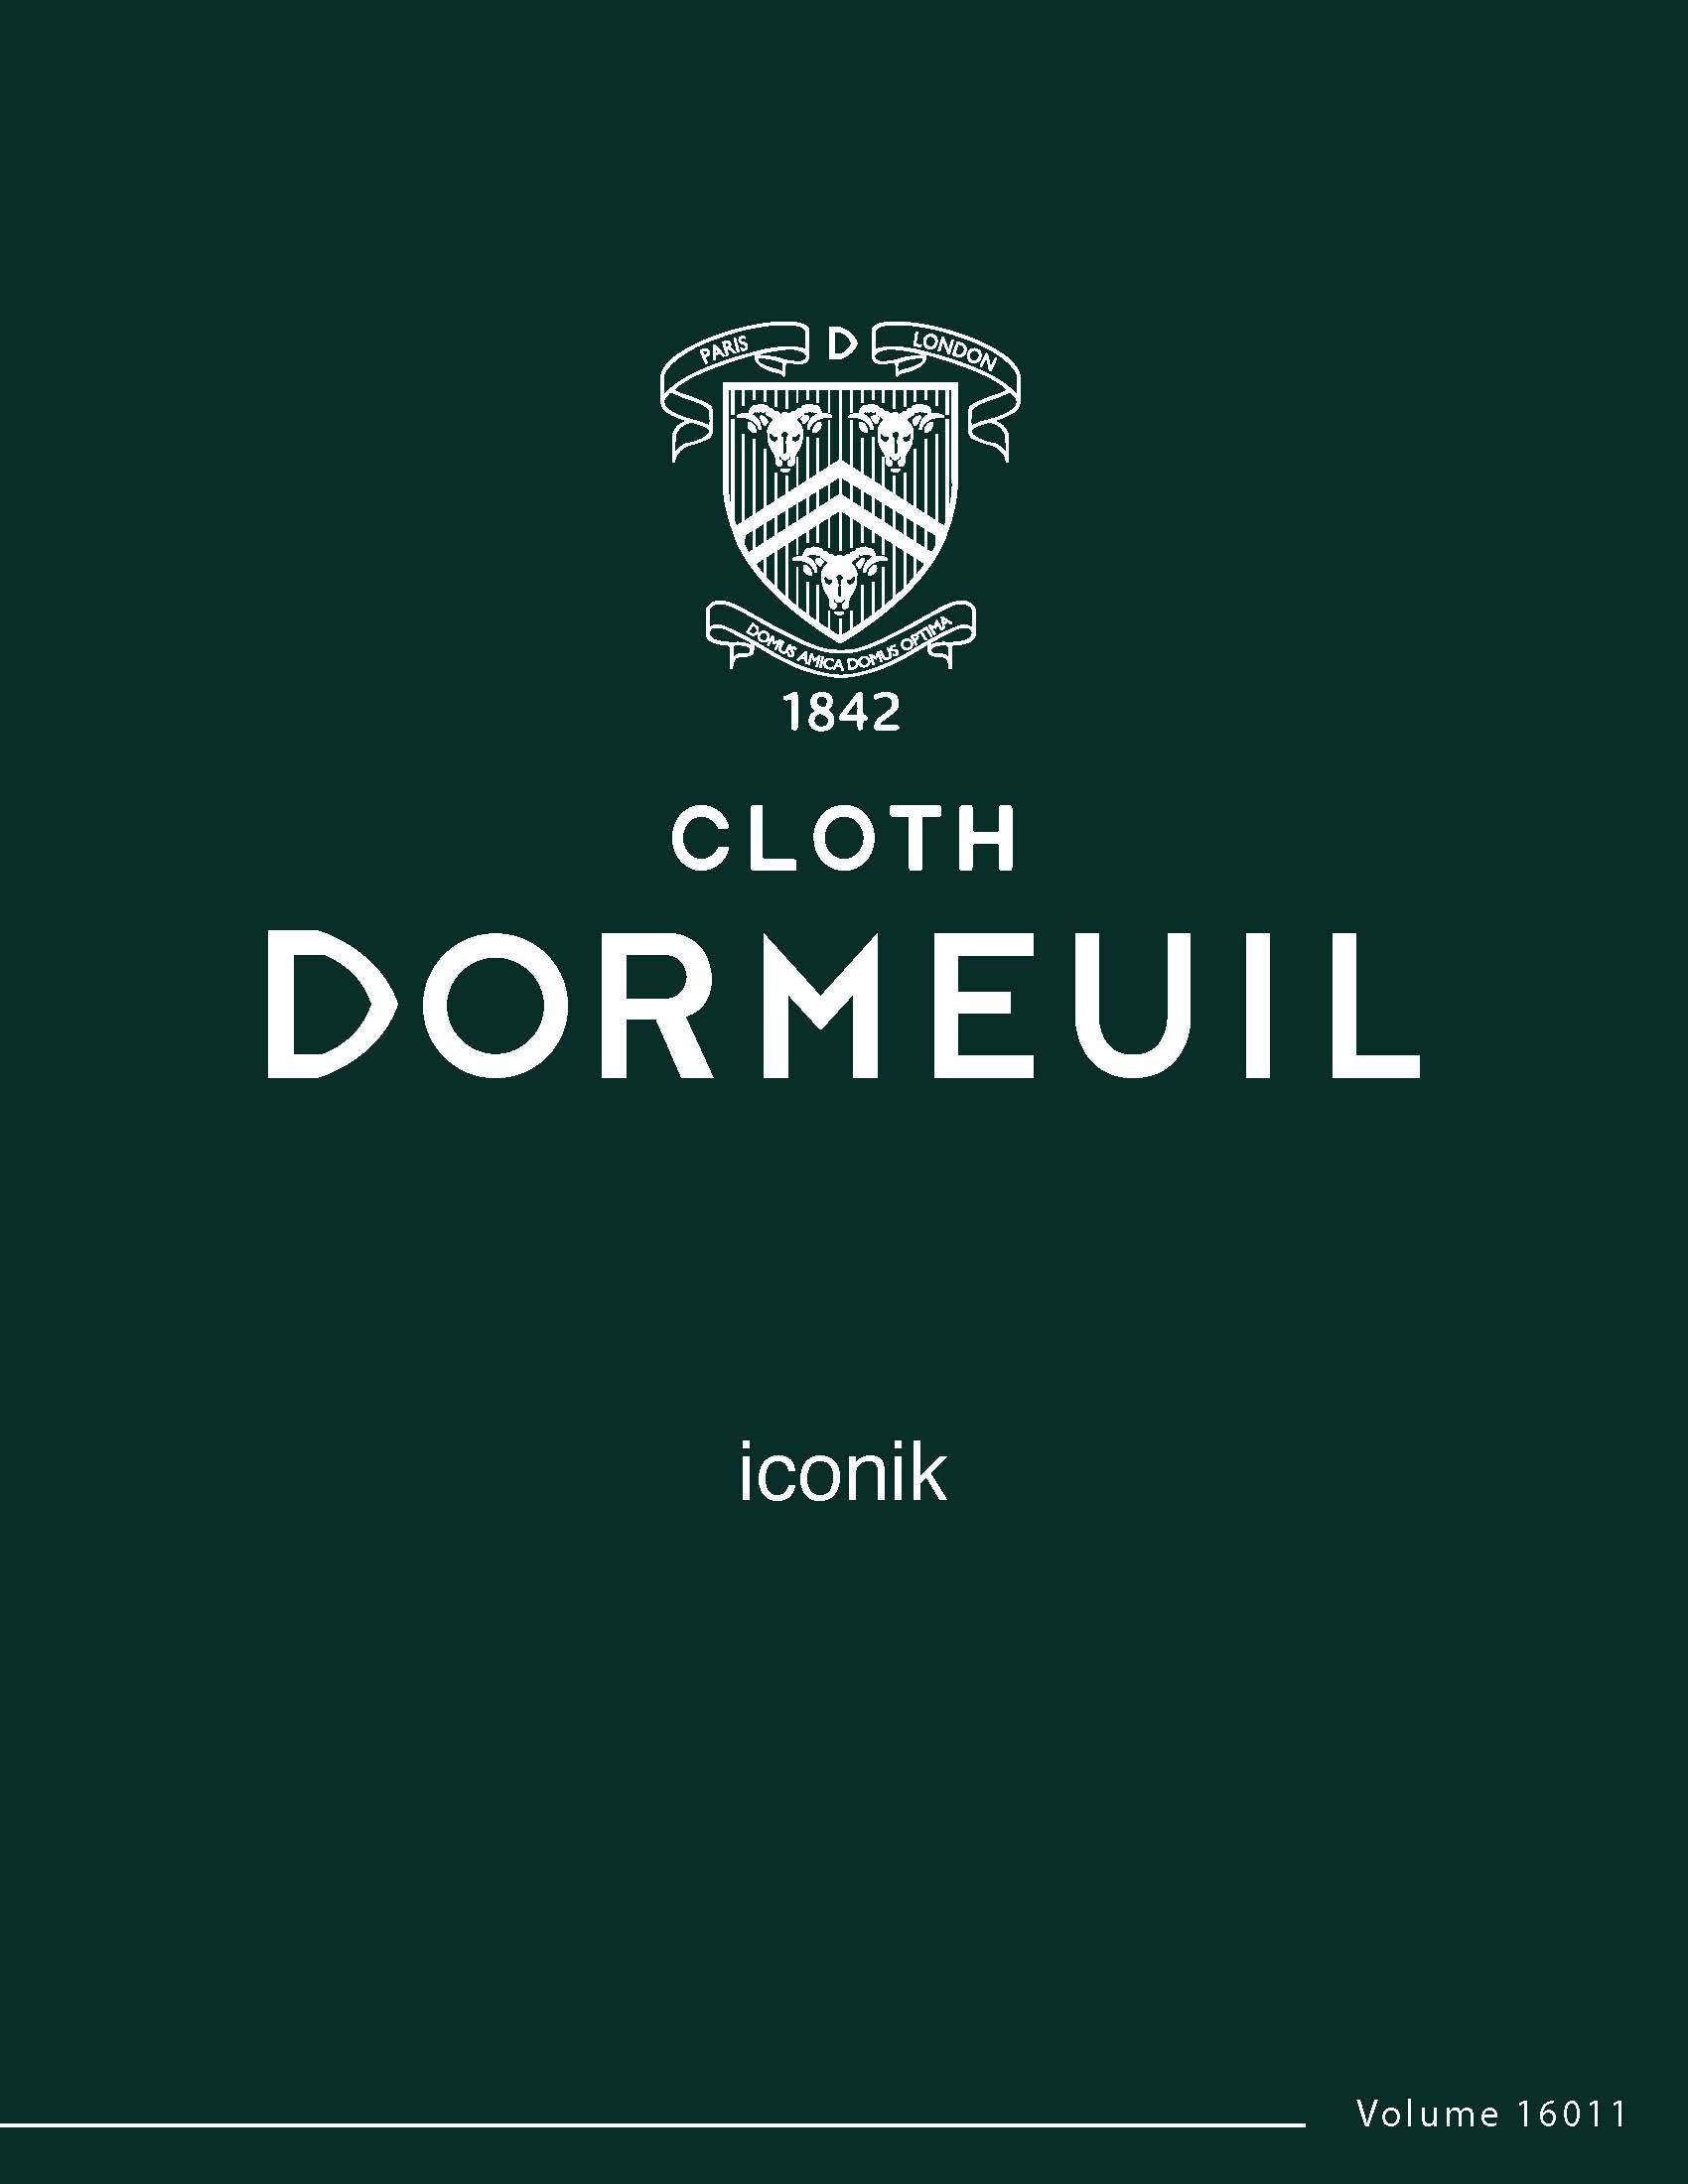 Dormeuil_Iconik_V16011.jpg